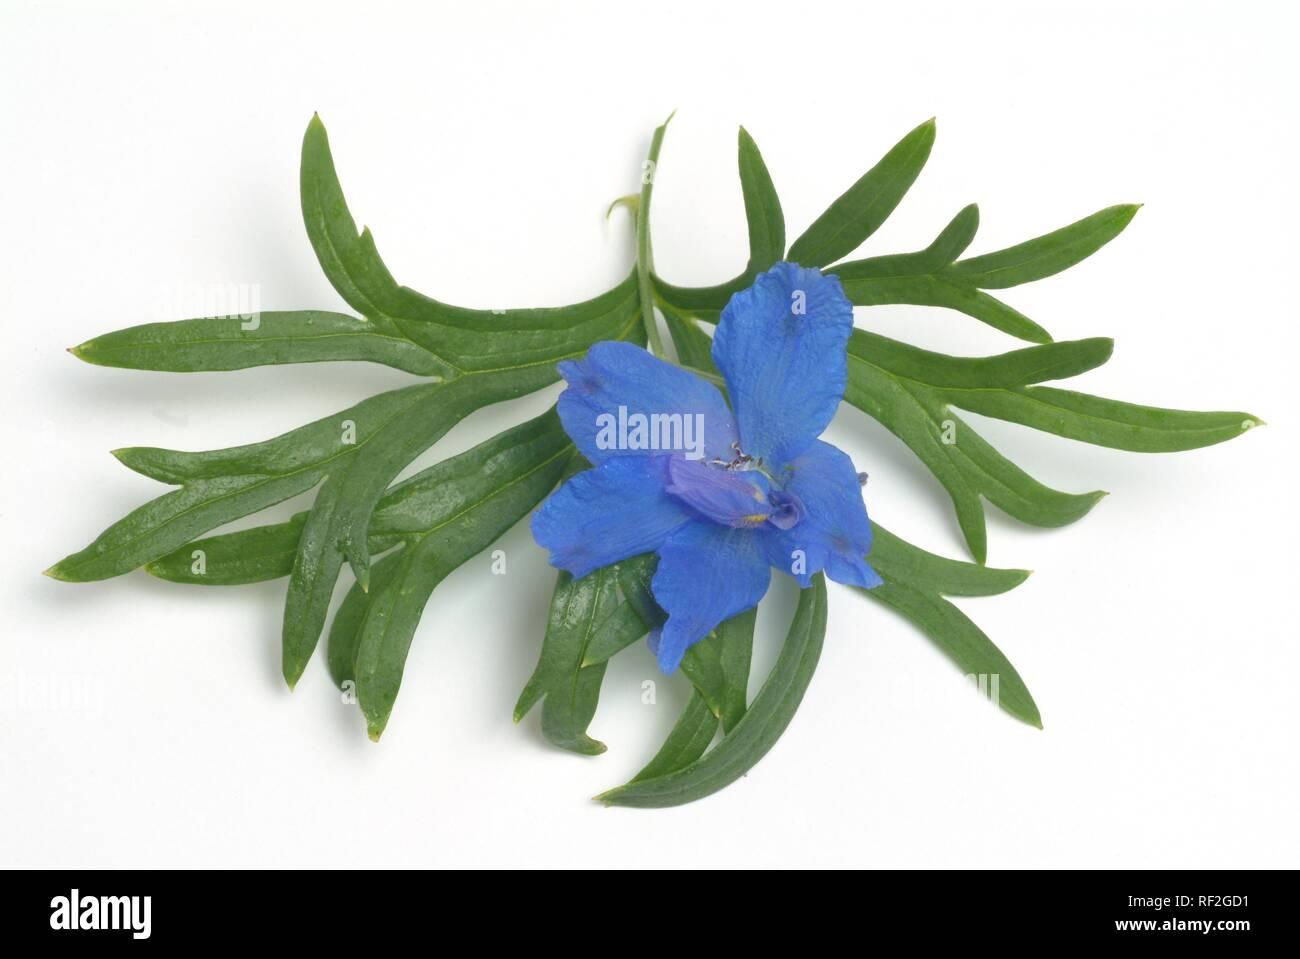 Forking Larkspur (Consolida regalis, Delphinium consolida), medicinal plant - Stock Image